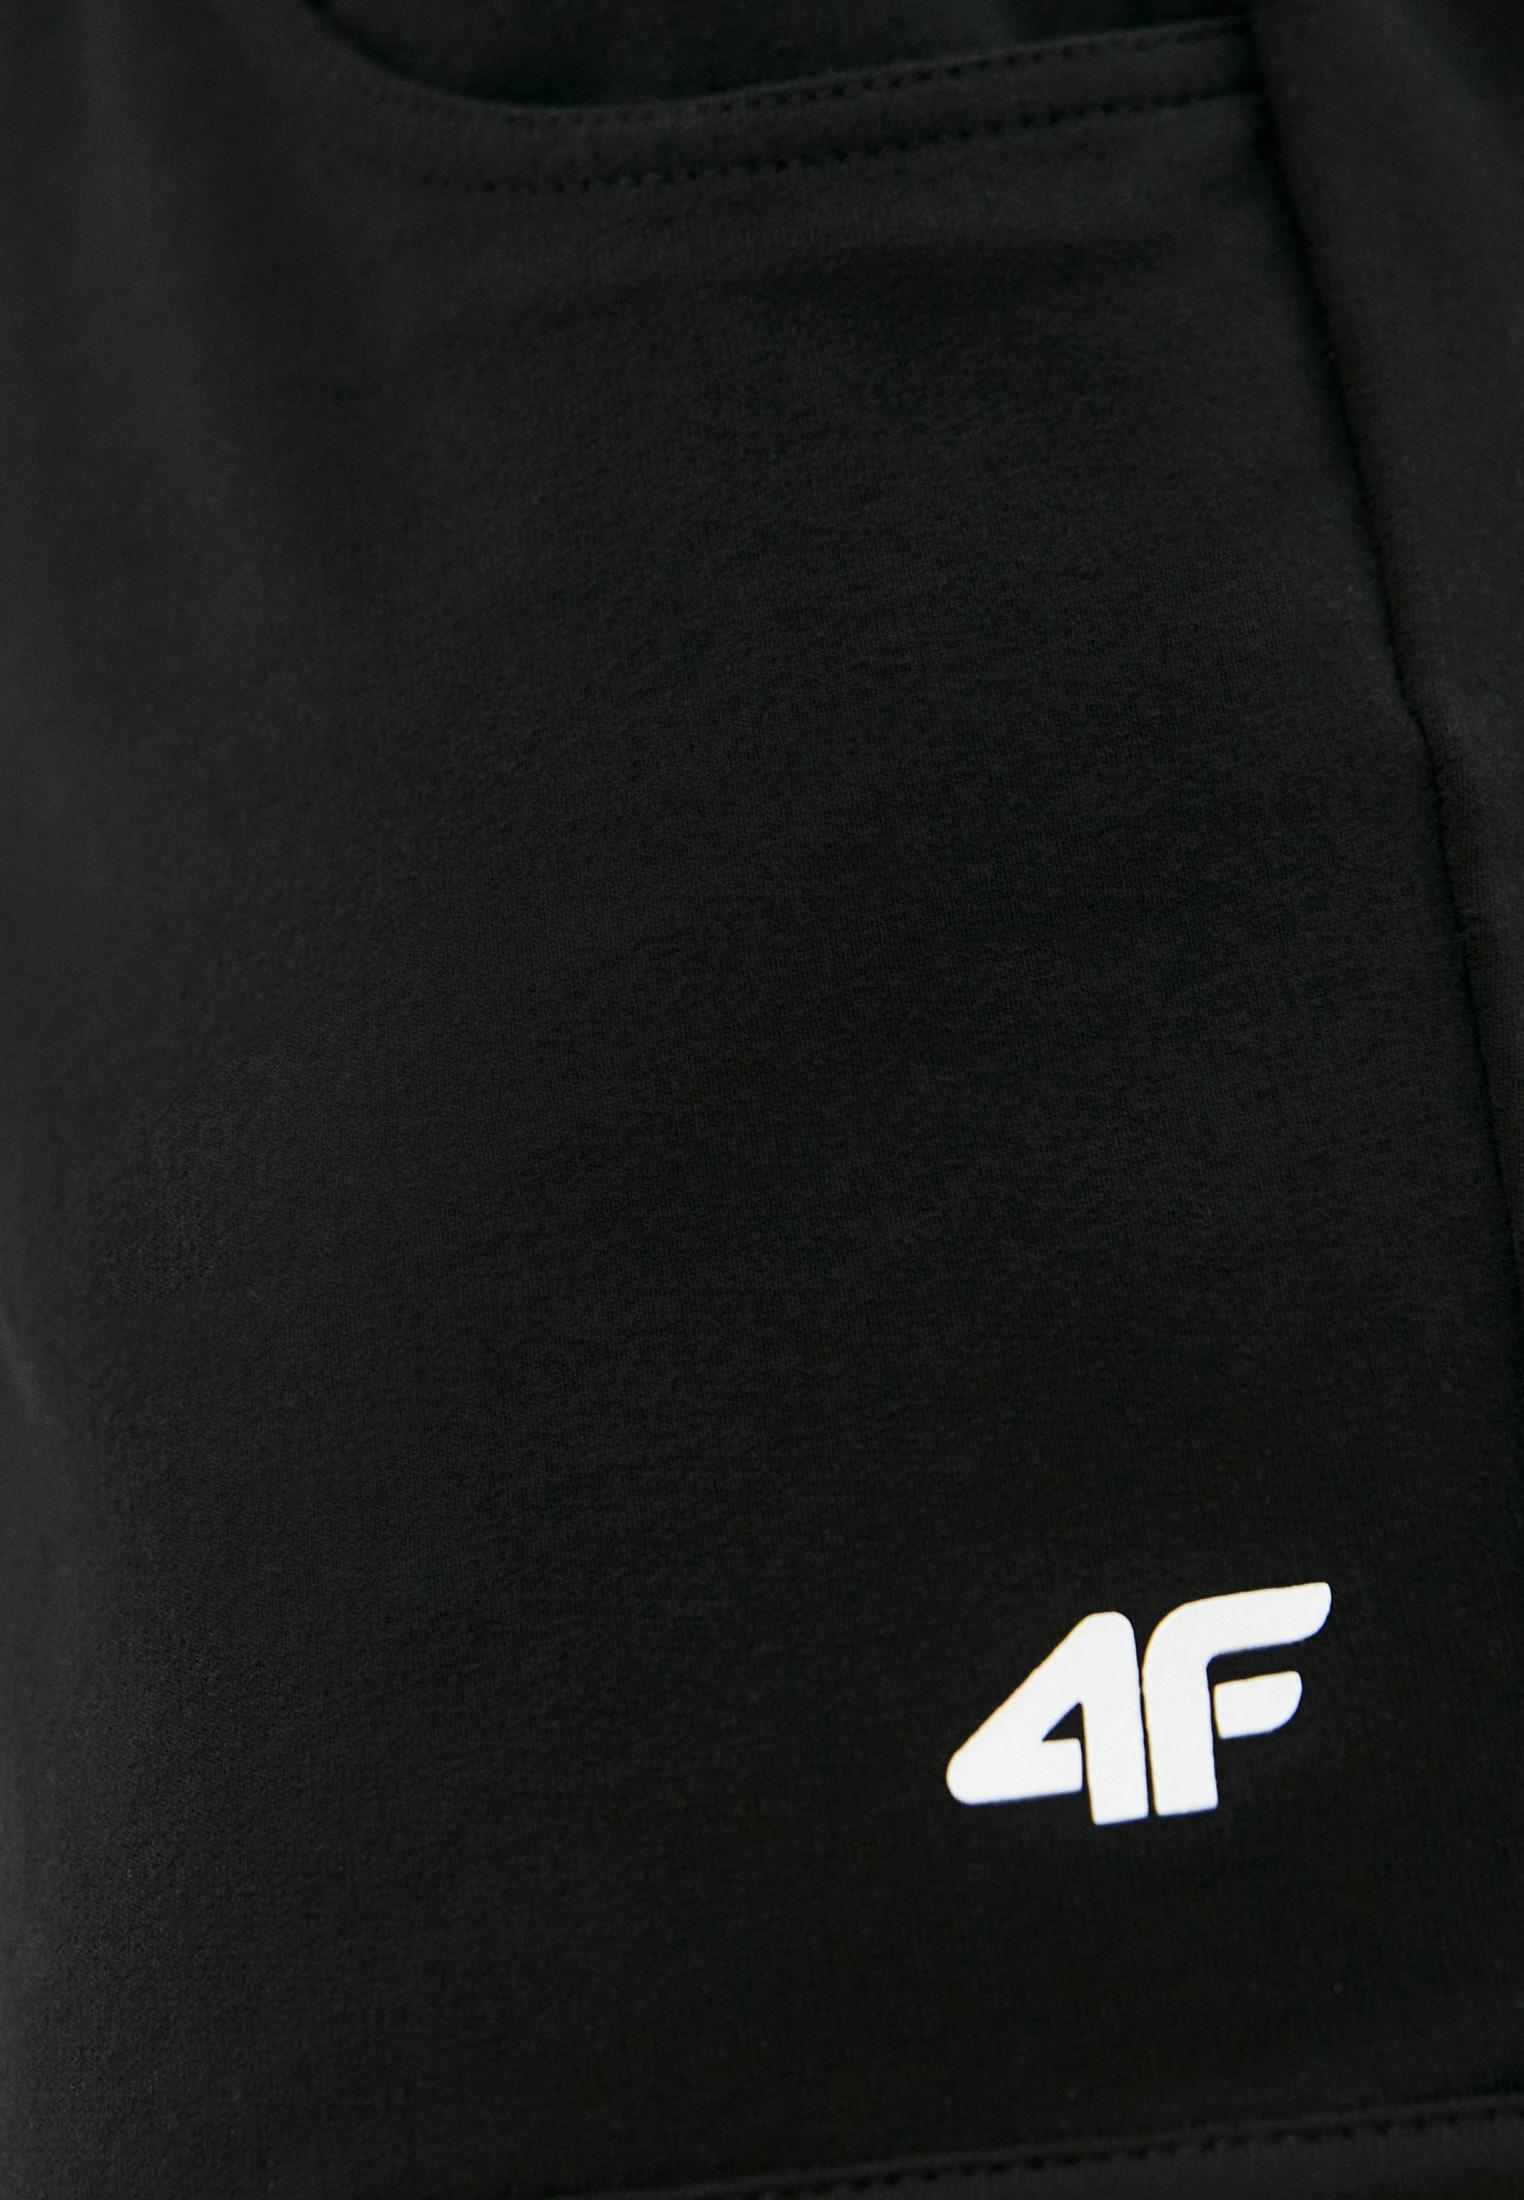 4F NOSH4-SKDD001: изображение 4